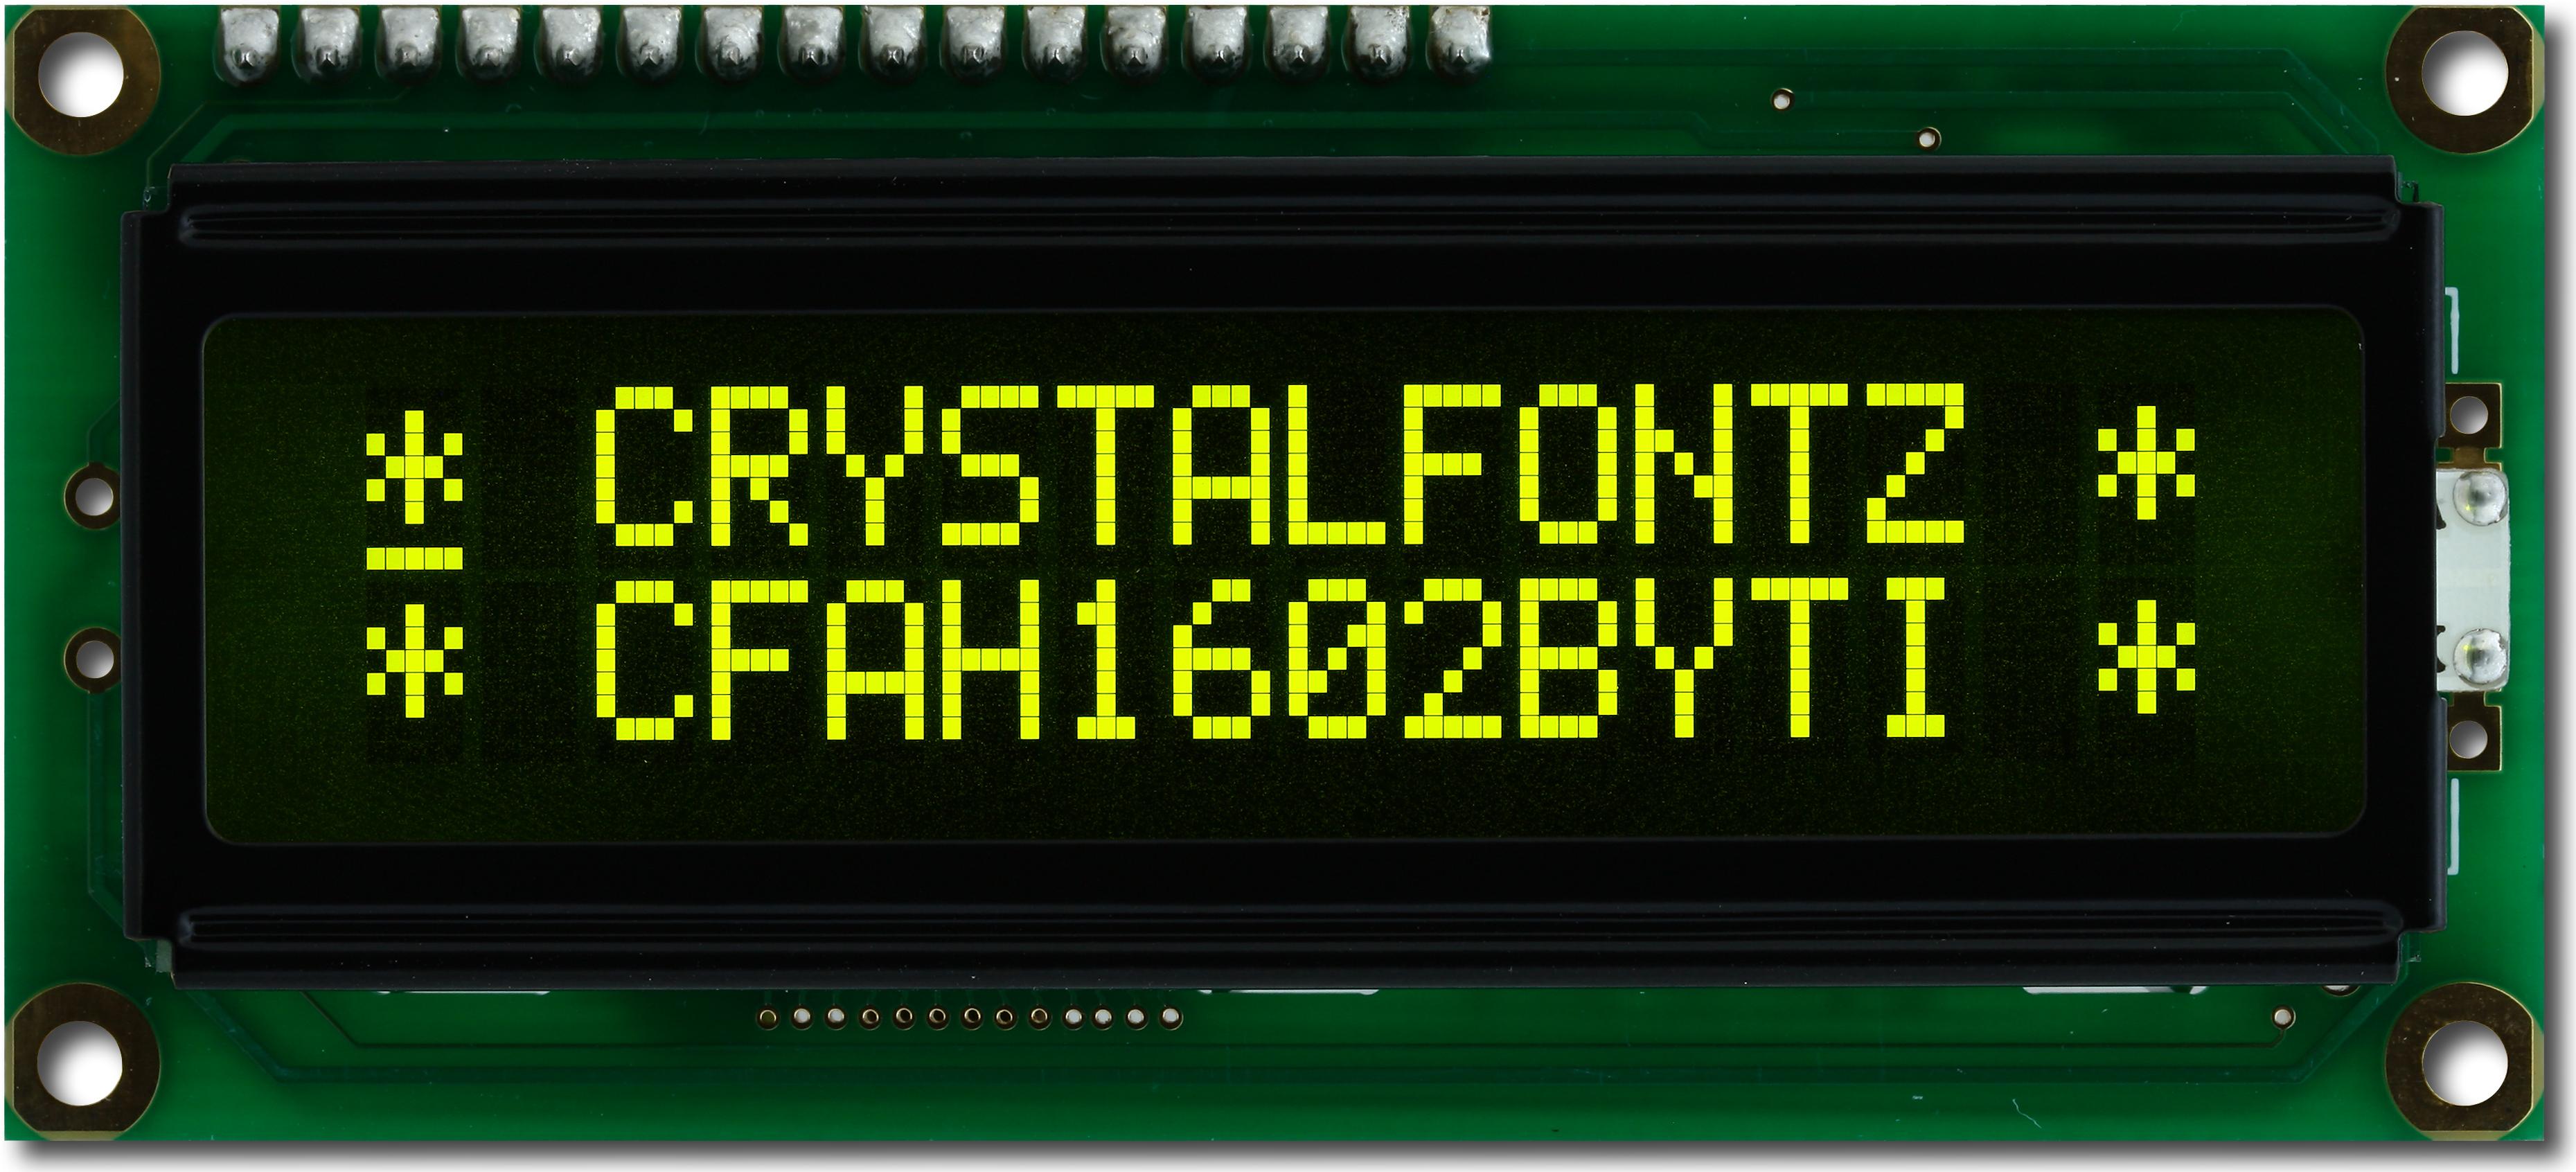 16x2 Yellow on Dark Character LCD